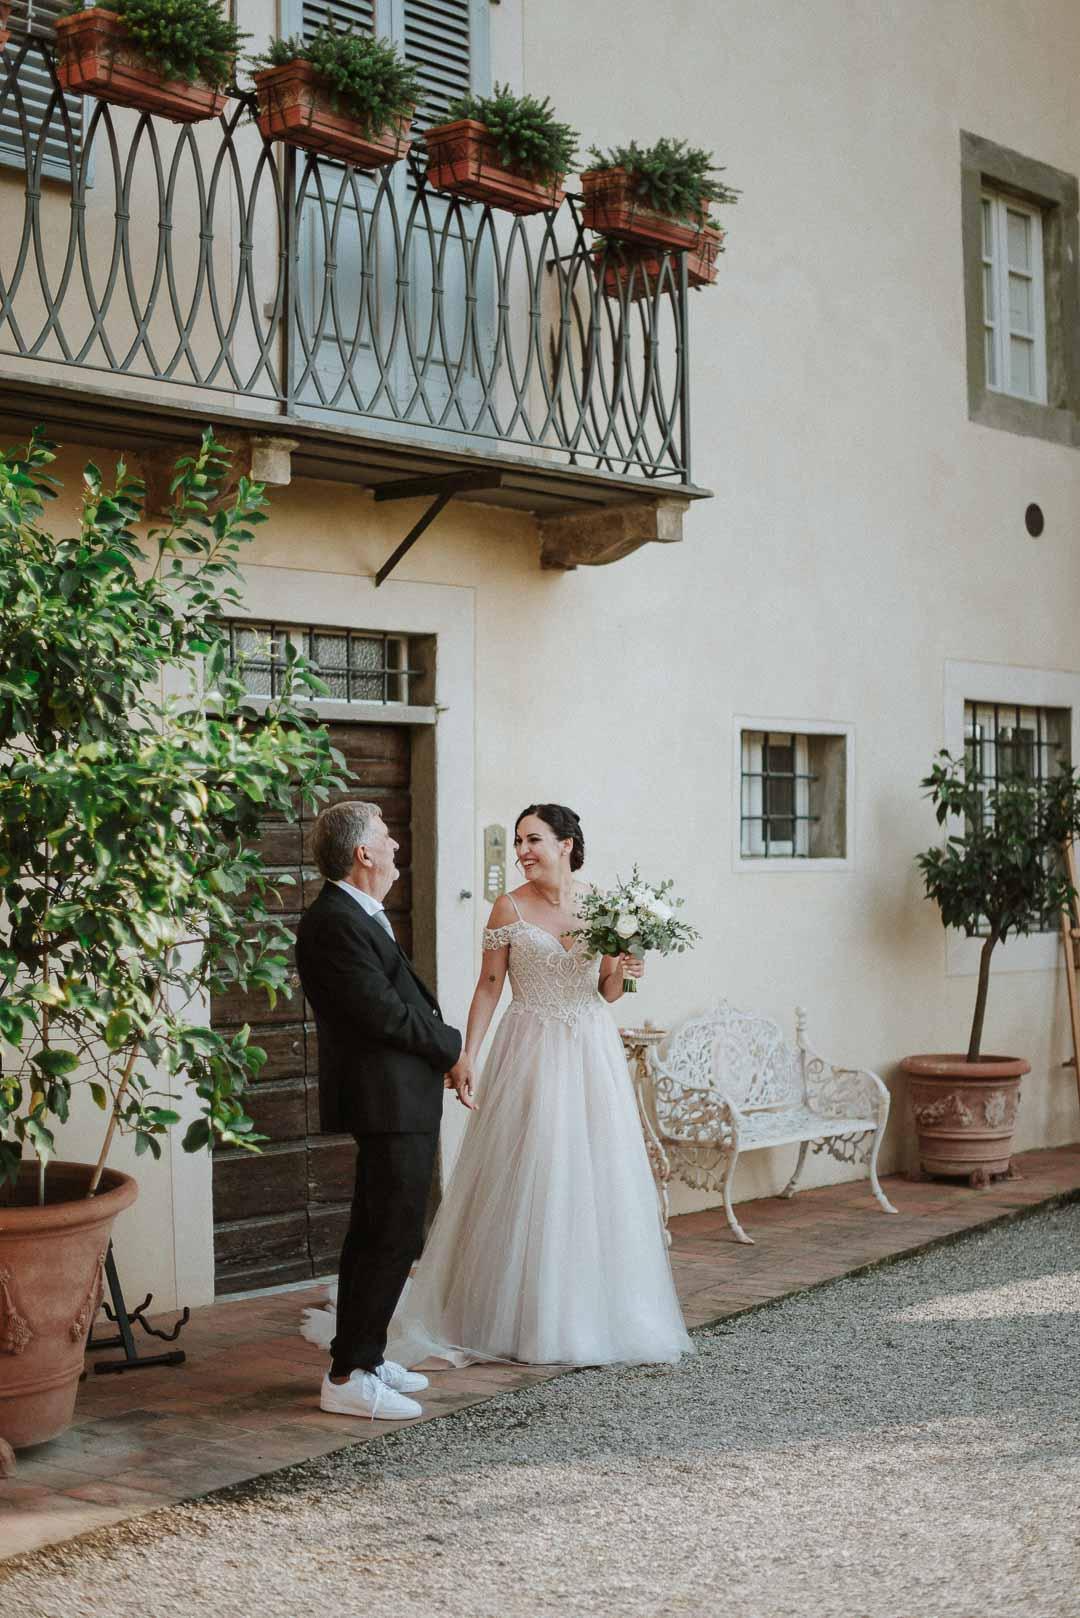 wedding-photographer-destination-fineart-bespoke-reportage-tuscany-villascorzi-vivianeizzo-spazio46-62